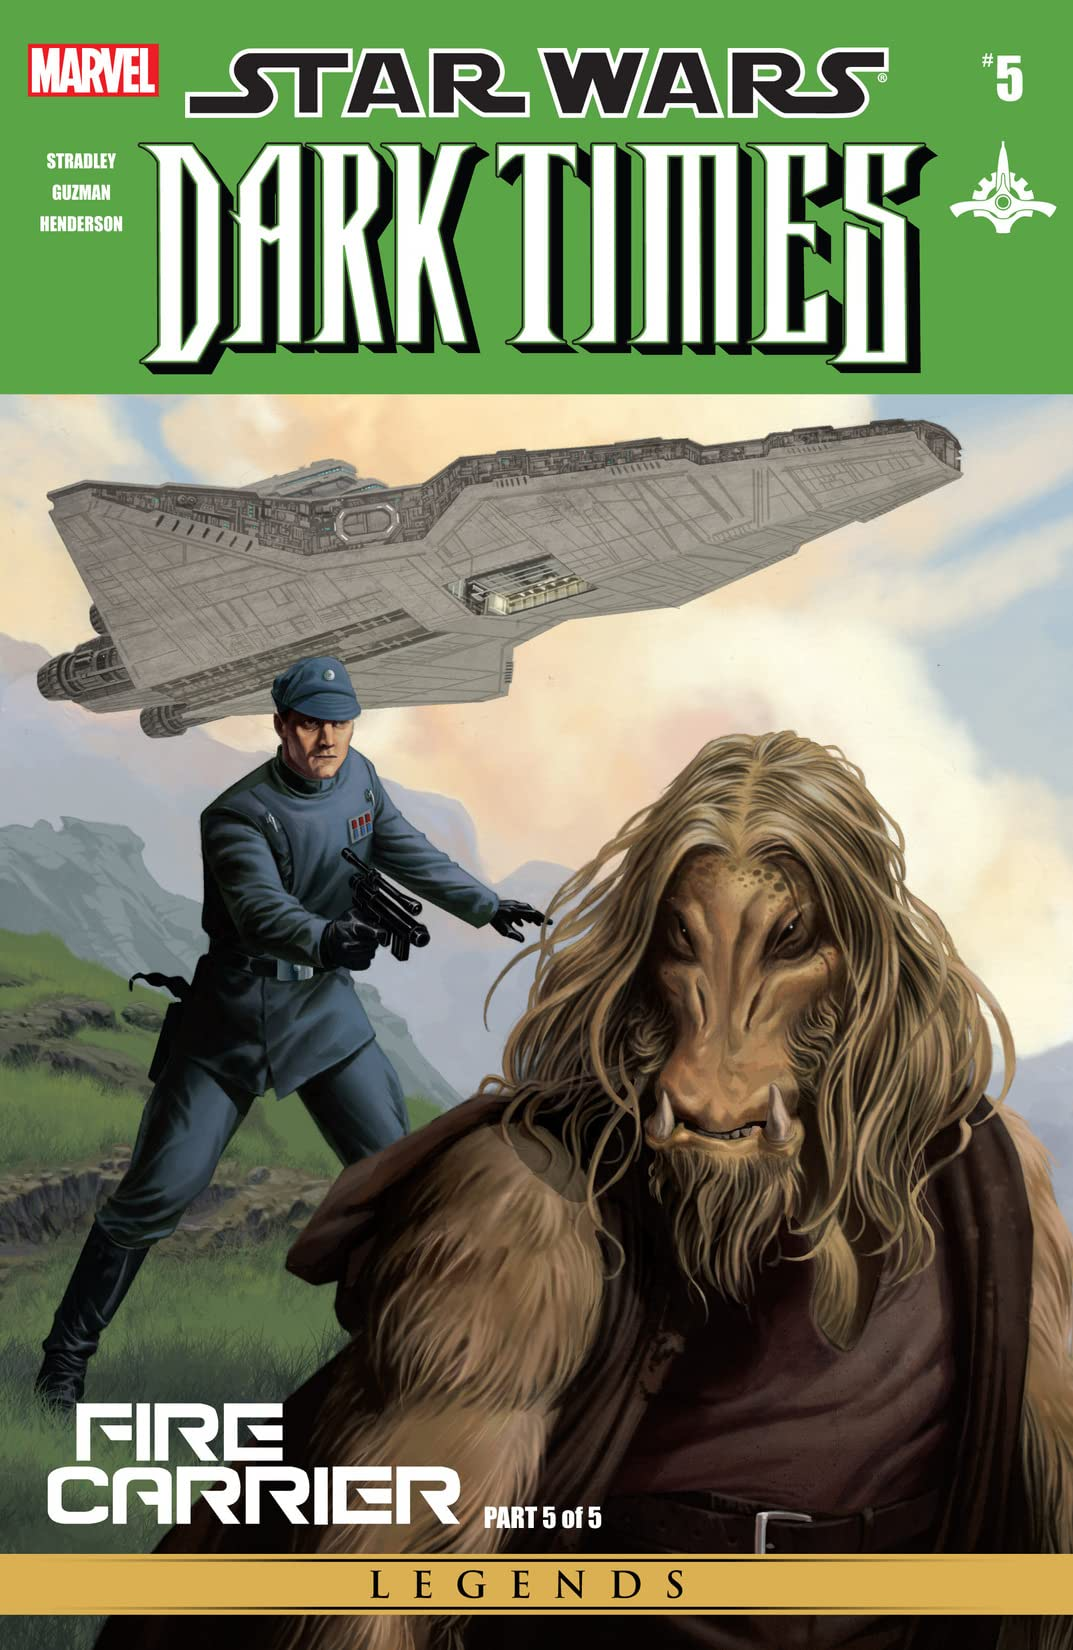 Star Wars: Dark Times - Fire Carrier (2013) #5 (of 5)